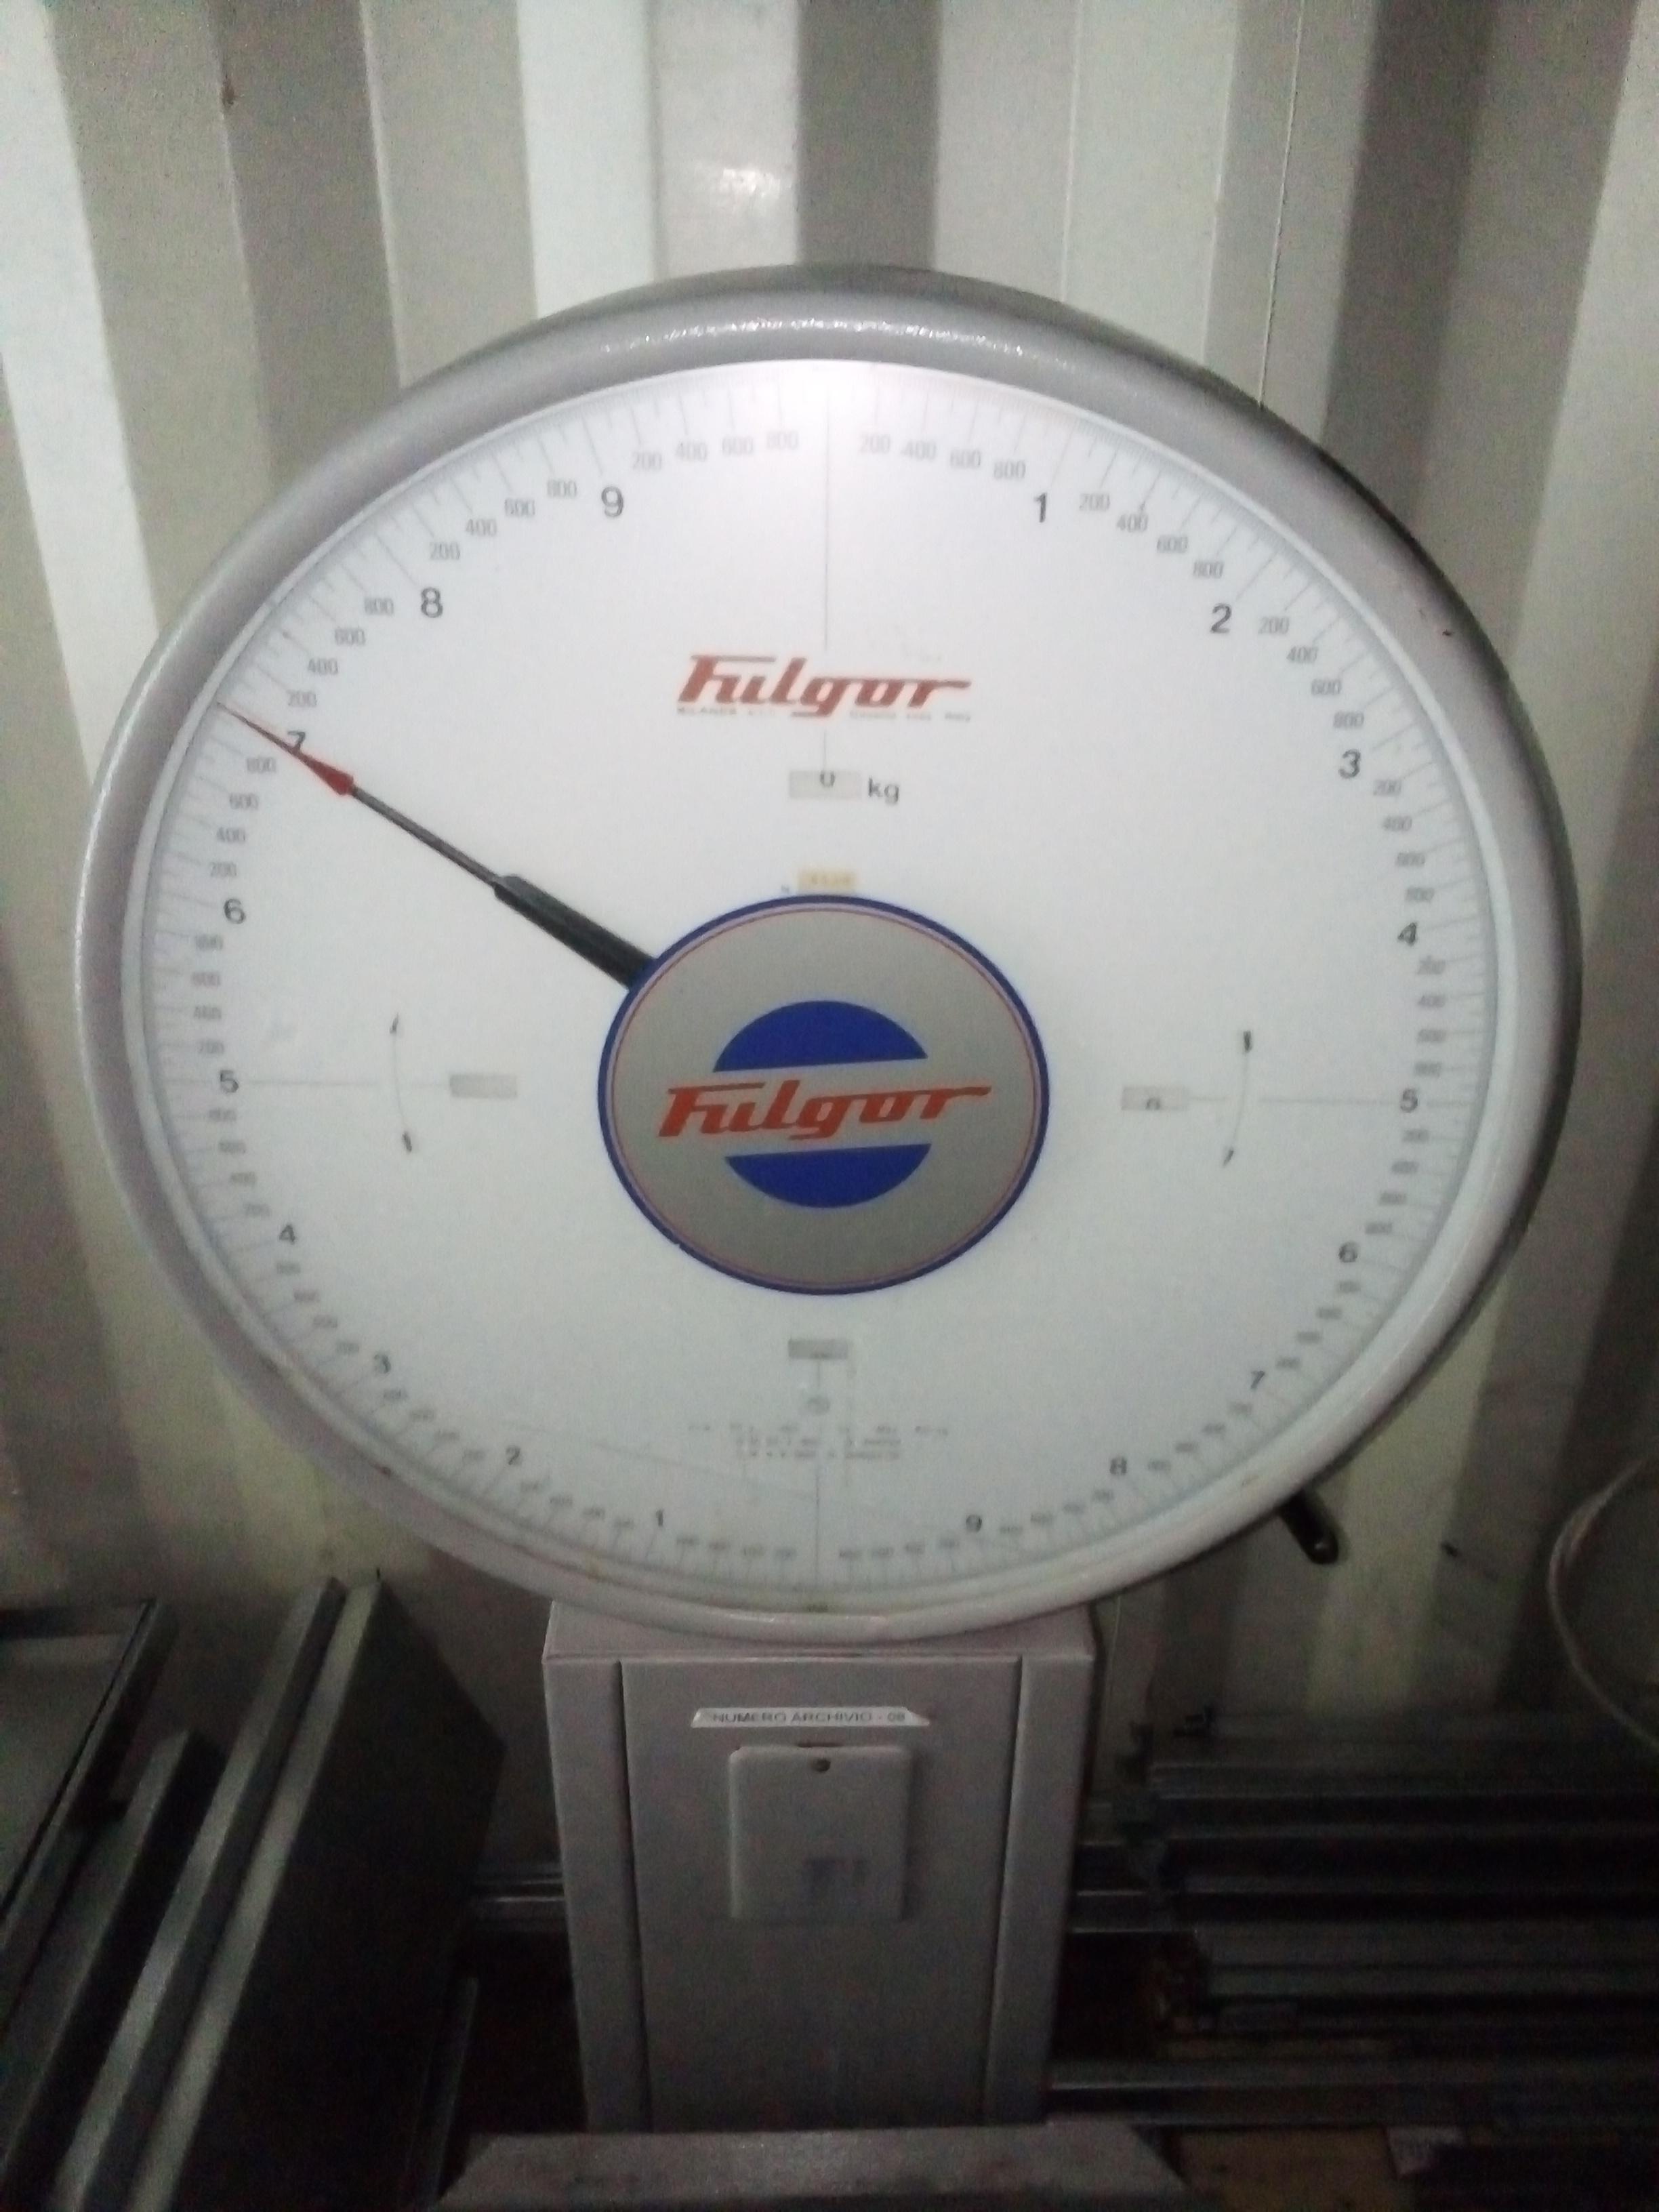 Bilancia Industriale Fulgar in vendita - foto 2